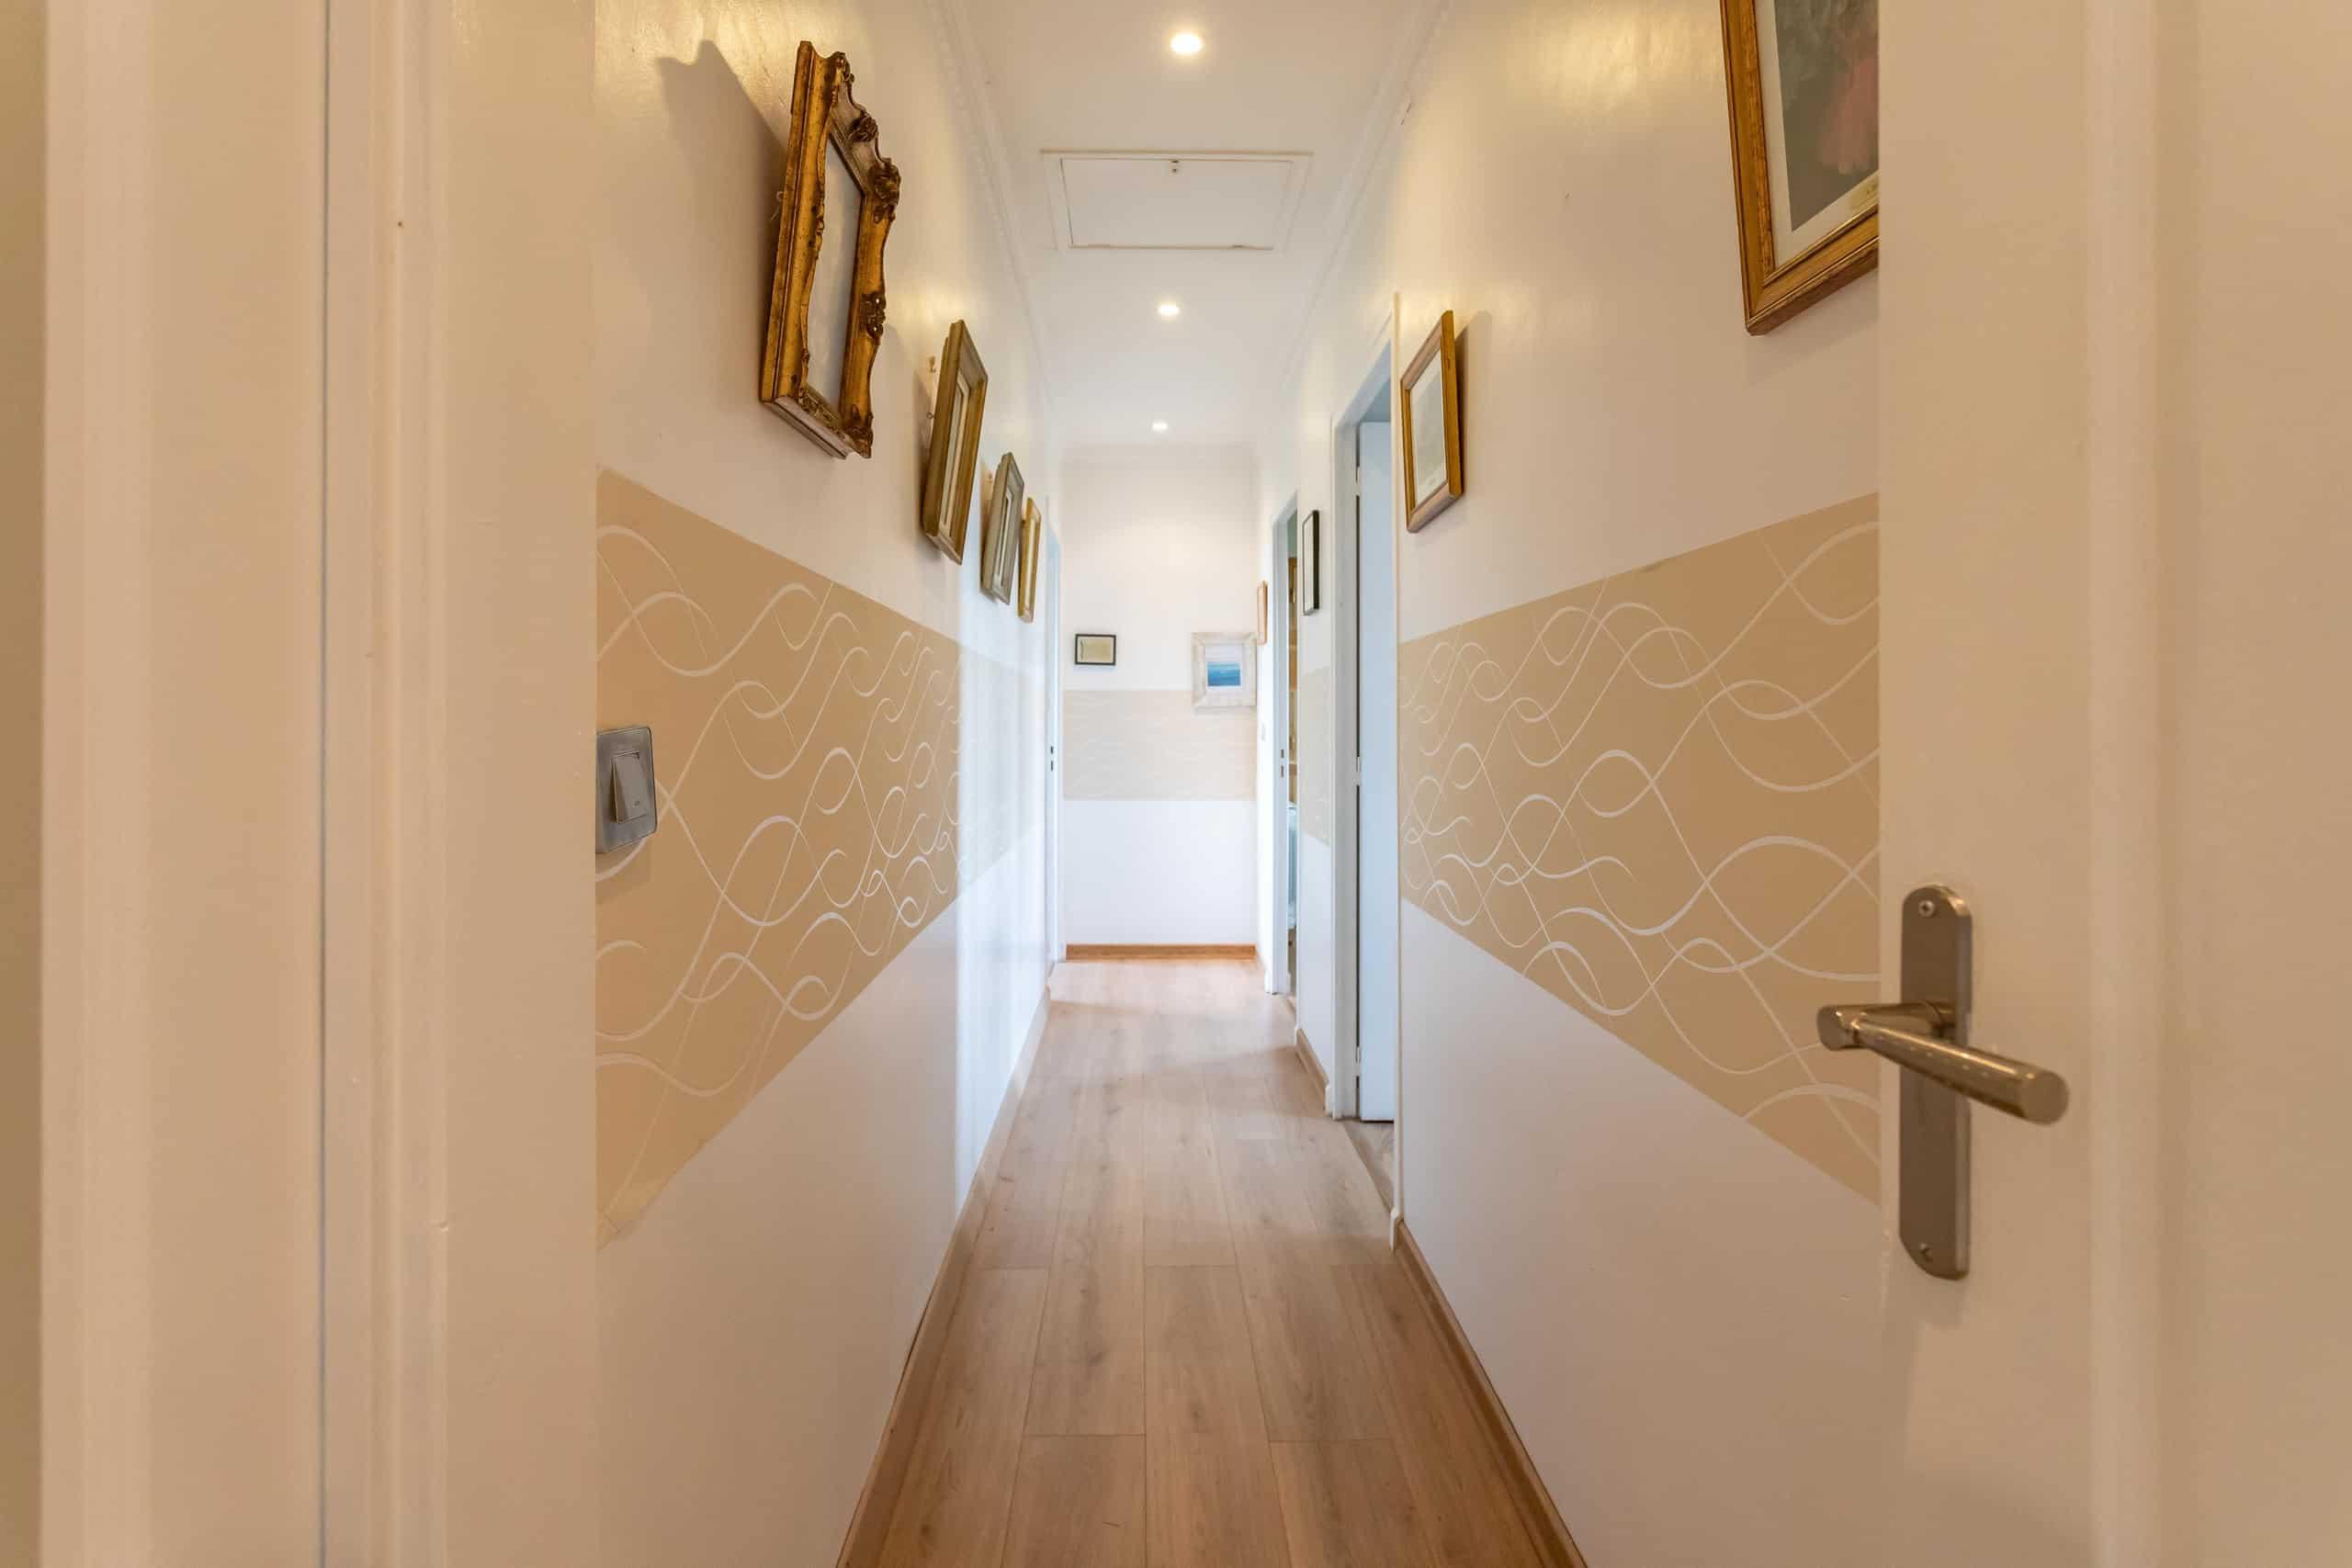 Corridor-WMC109